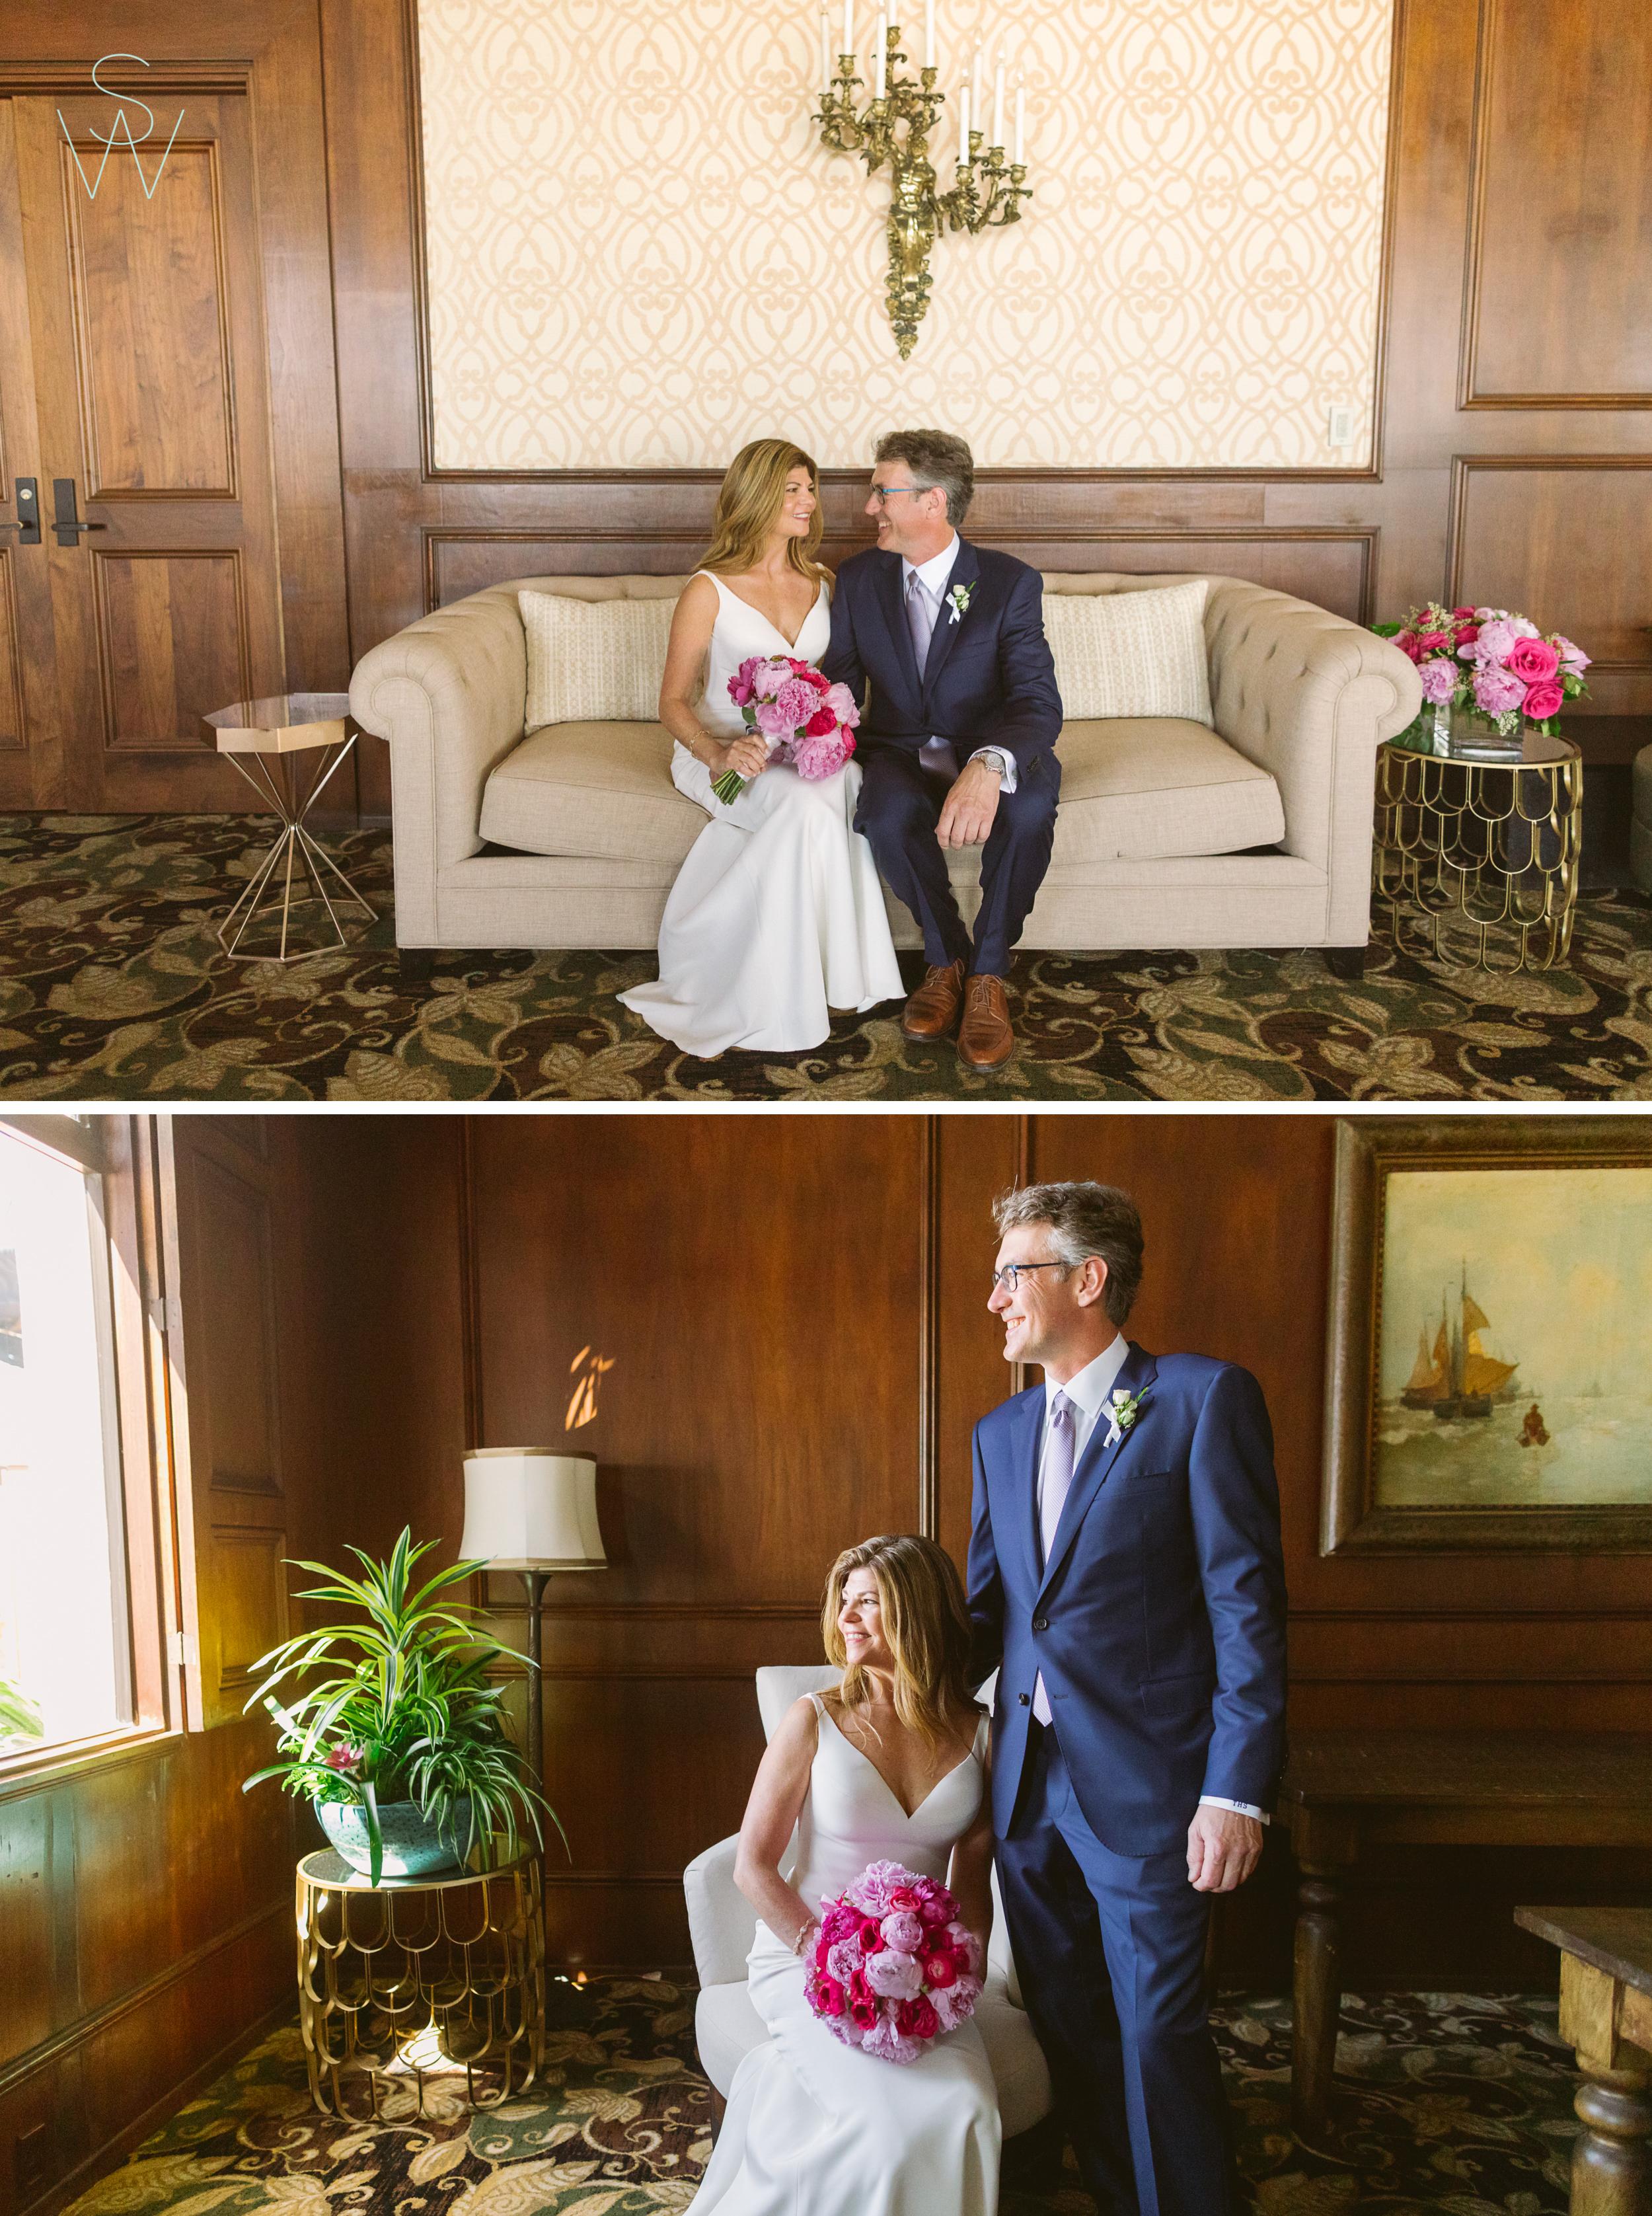 shewanders.wedding.photography.la.jolla-1012.jpg